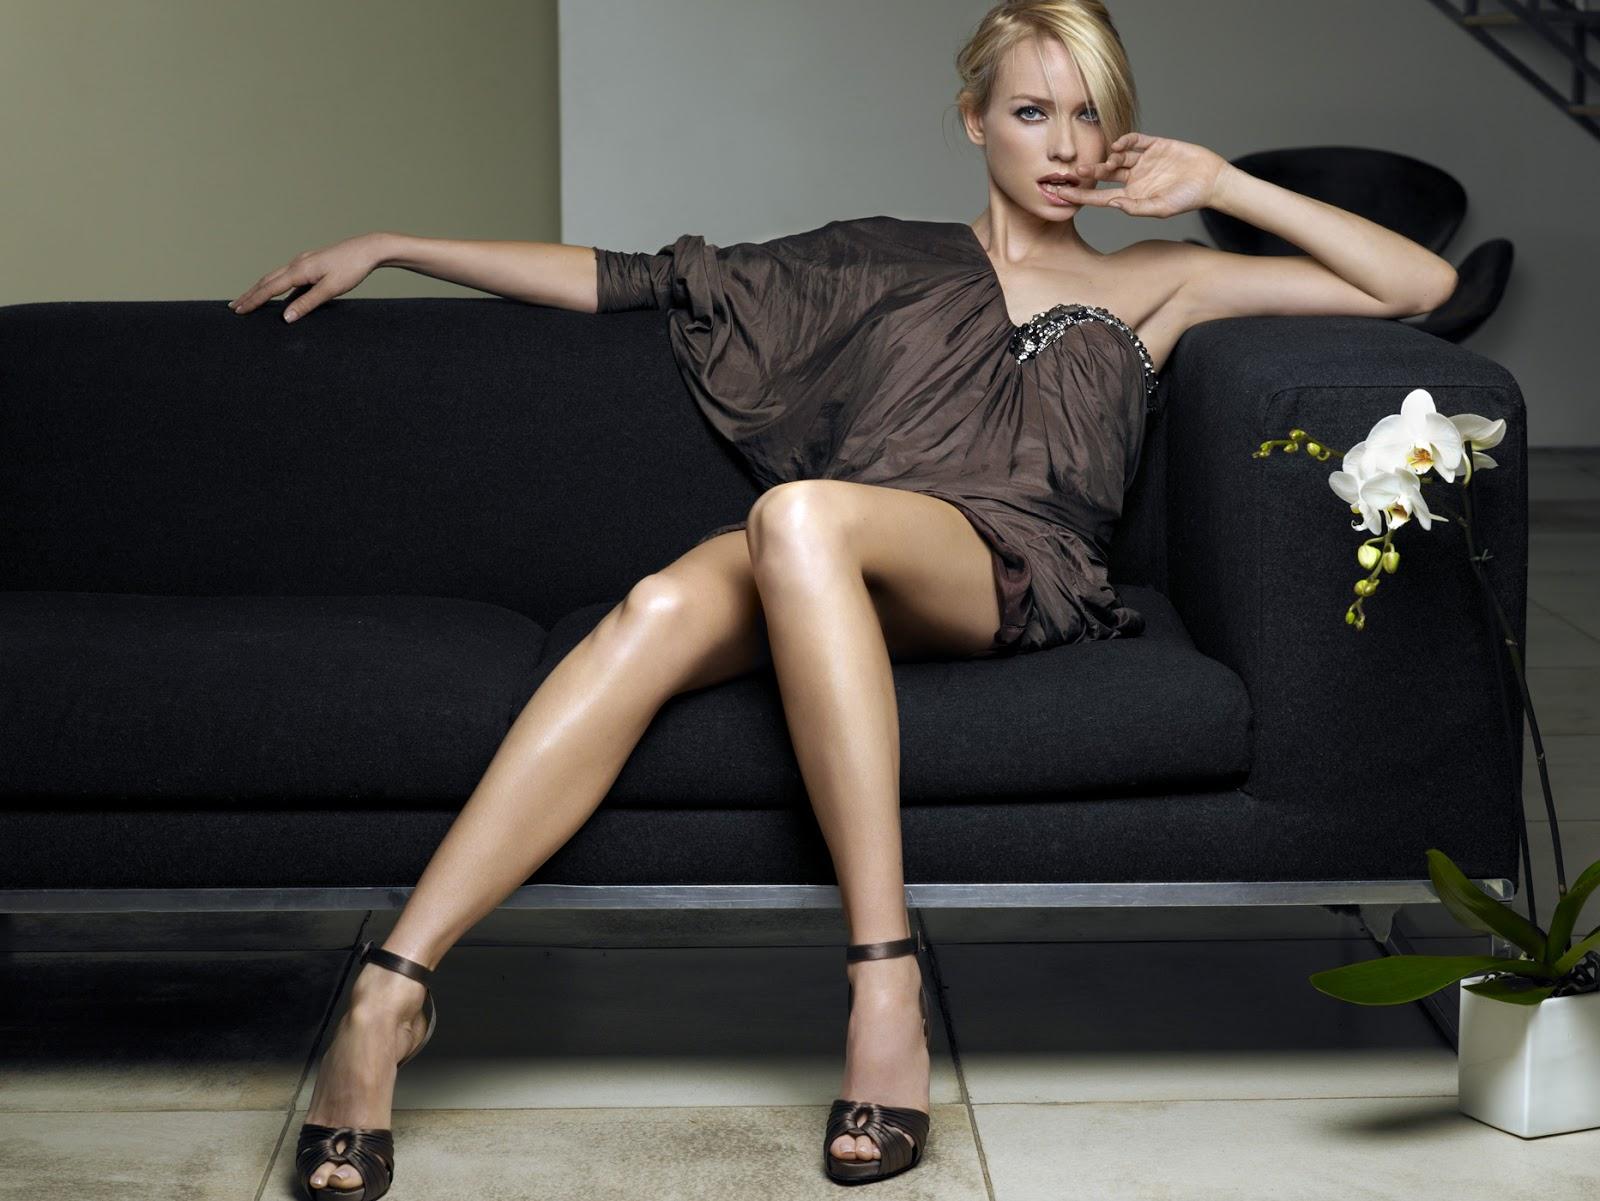 http://3.bp.blogspot.com/-L_UrSbWLIdc/TpCksfpYymI/AAAAAAAAFcc/EfsvyCDENuU/s1600/Naomi+Watts+20.jpg